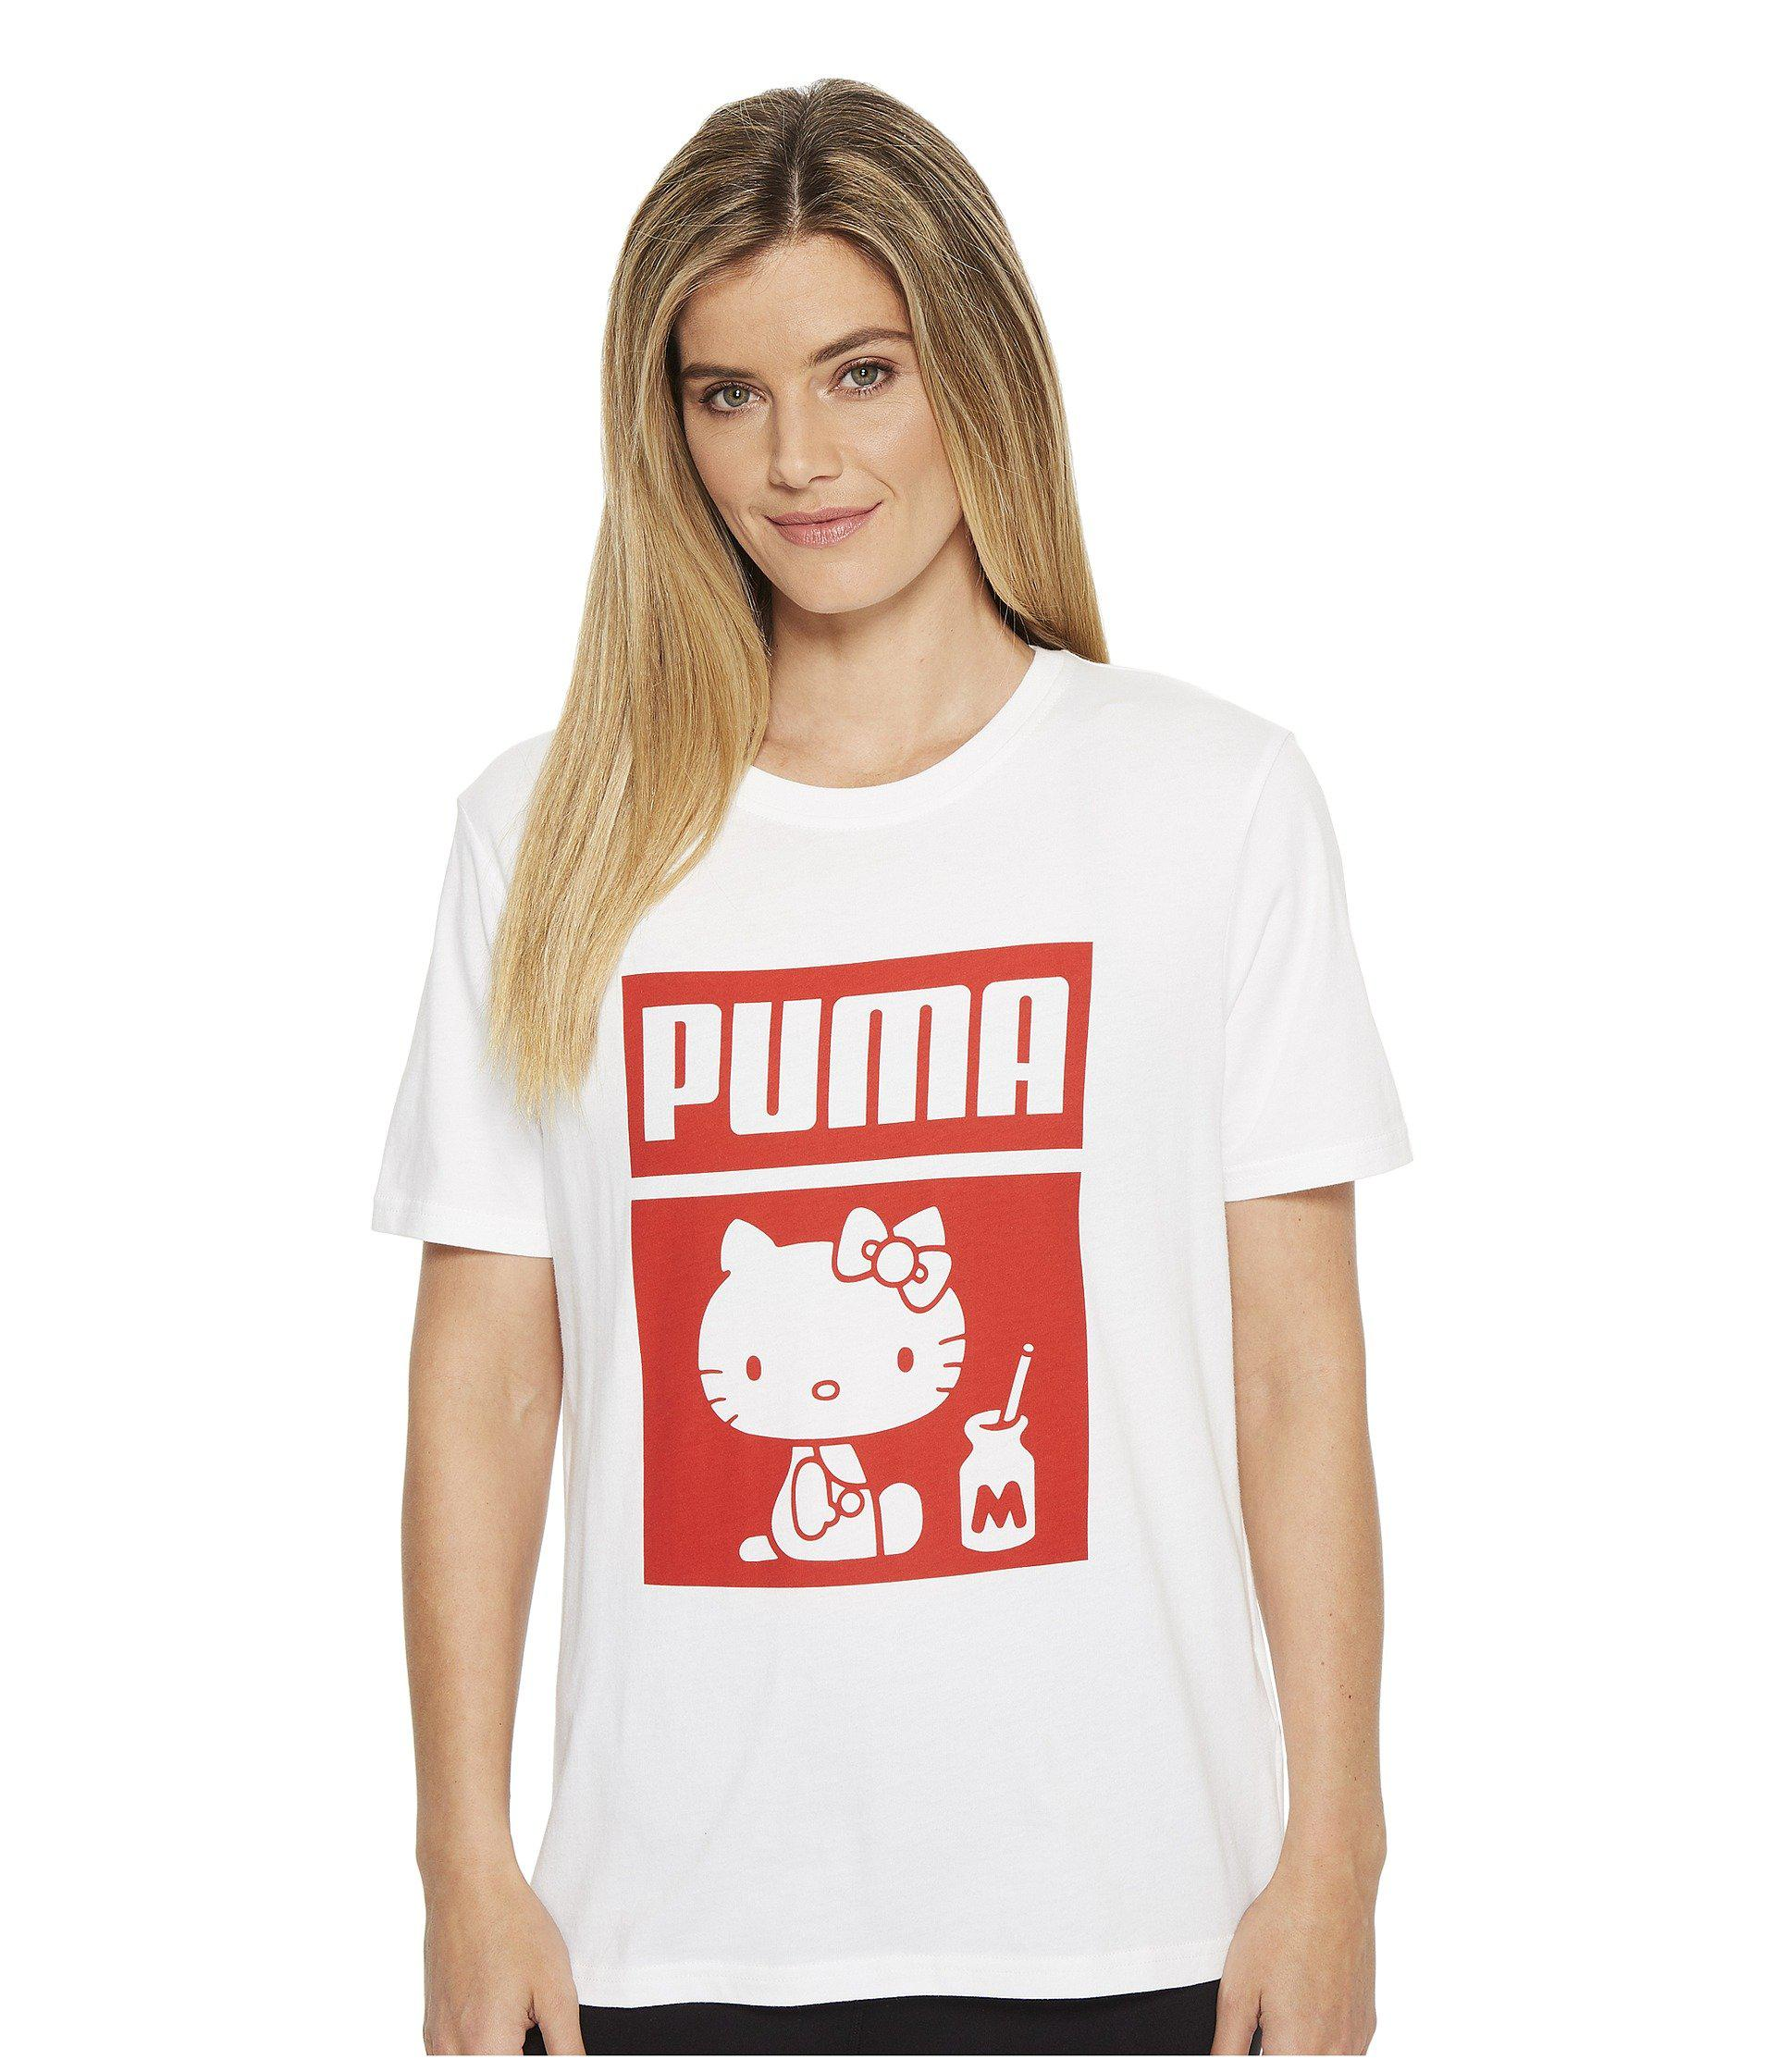 Tee White Puma Hello X Kitty F1cTK3ulJ